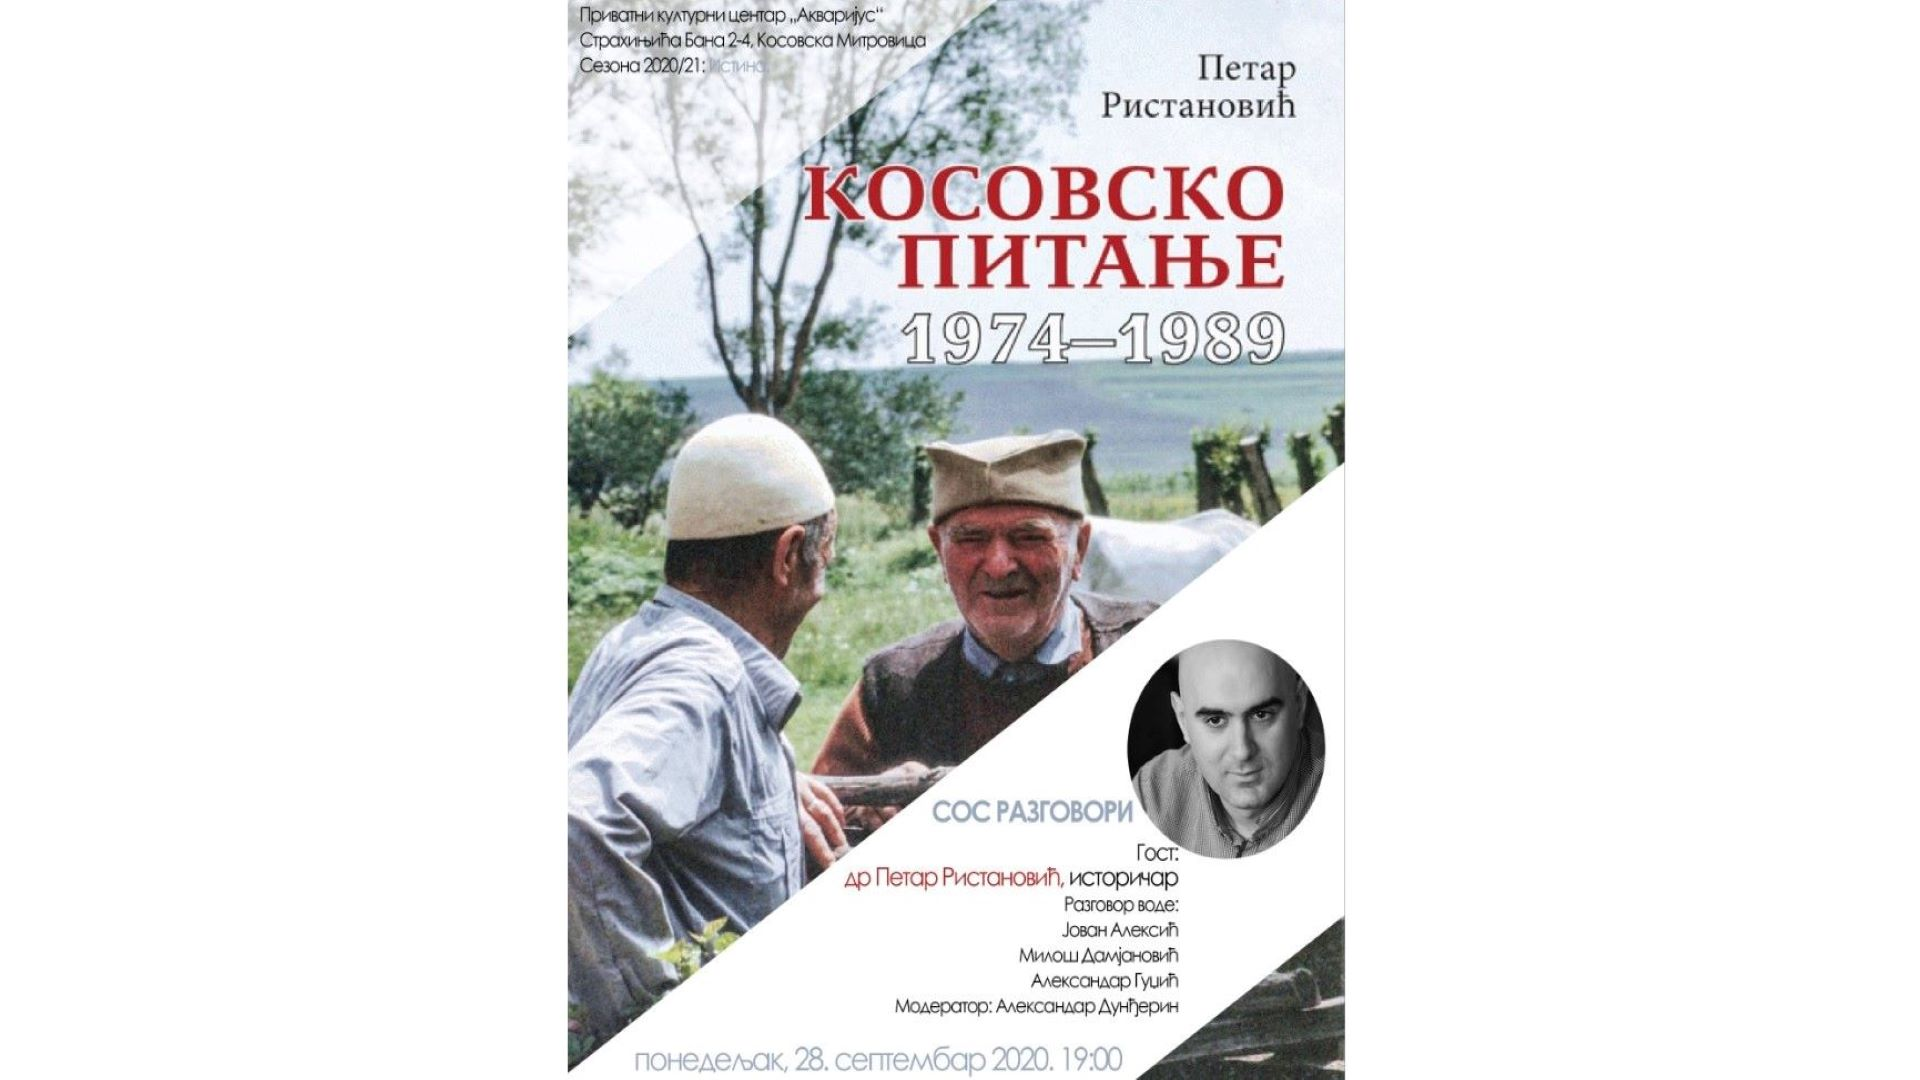 istoricar-petar-ristanovic-28-septembra-u-pkcakvarijus